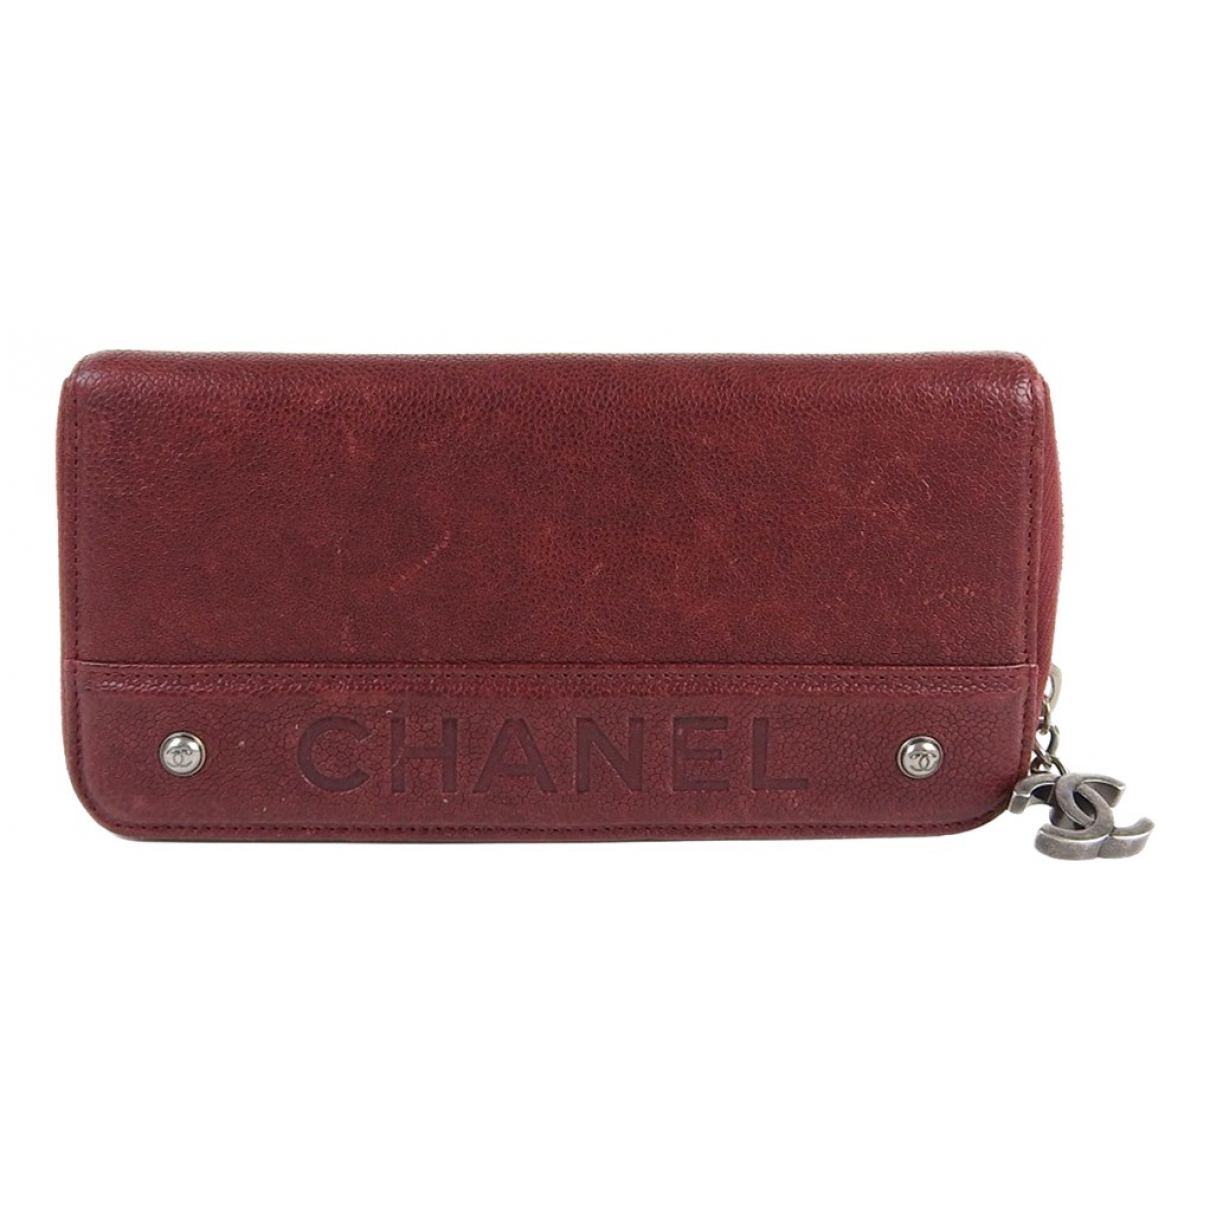 Chanel \N Burgundy Leather wallet for Women \N